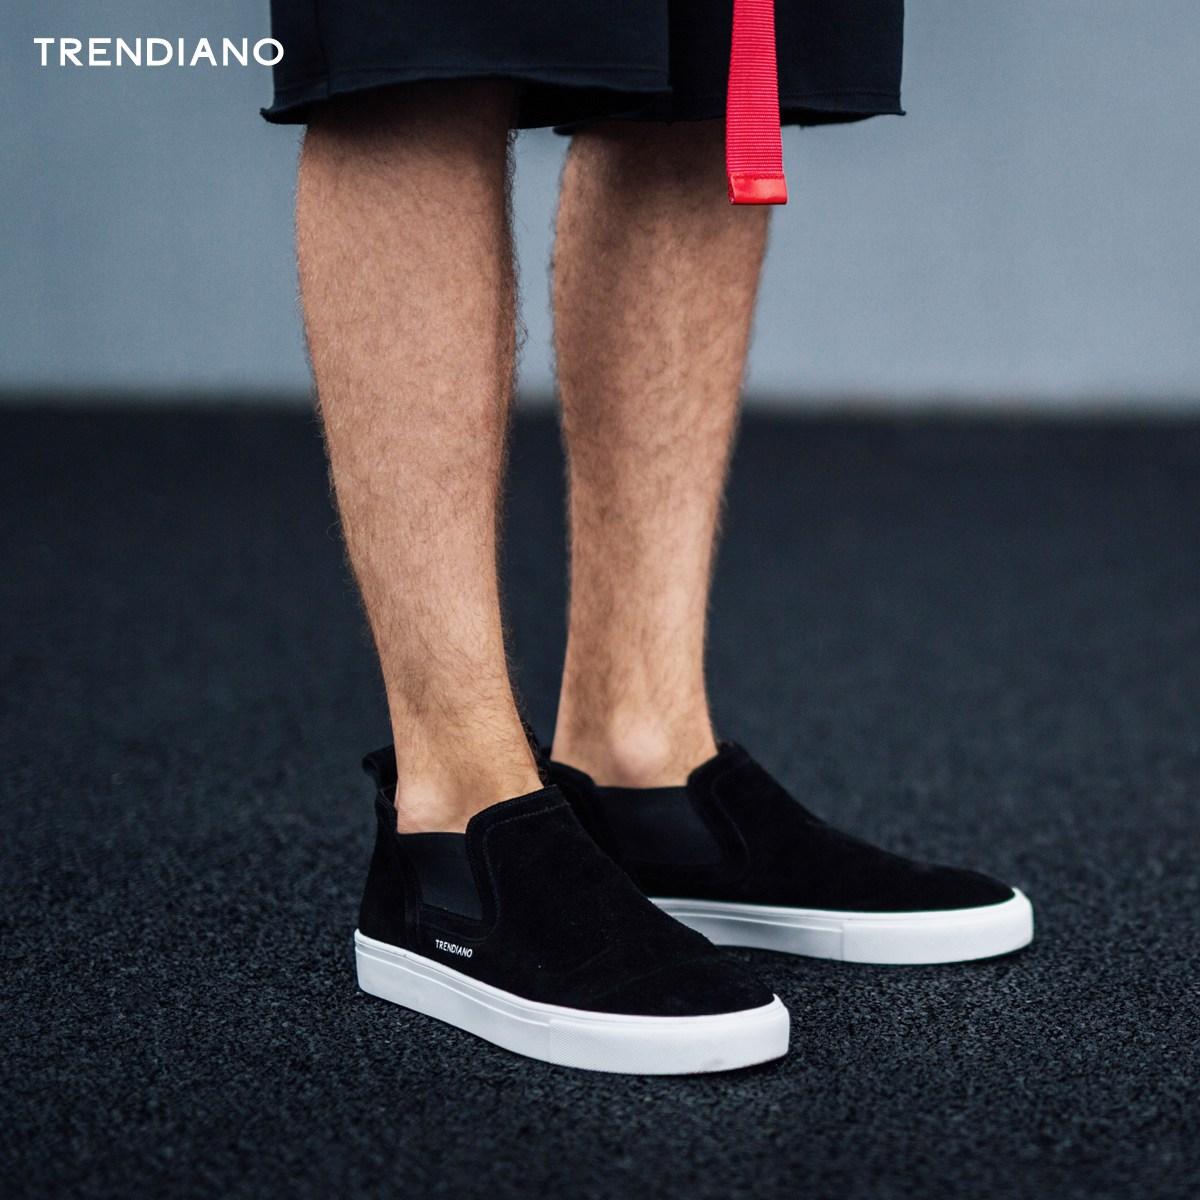 【聚】TRENDIANO反绒皮懒人低帮鞋板鞋3EA151803P